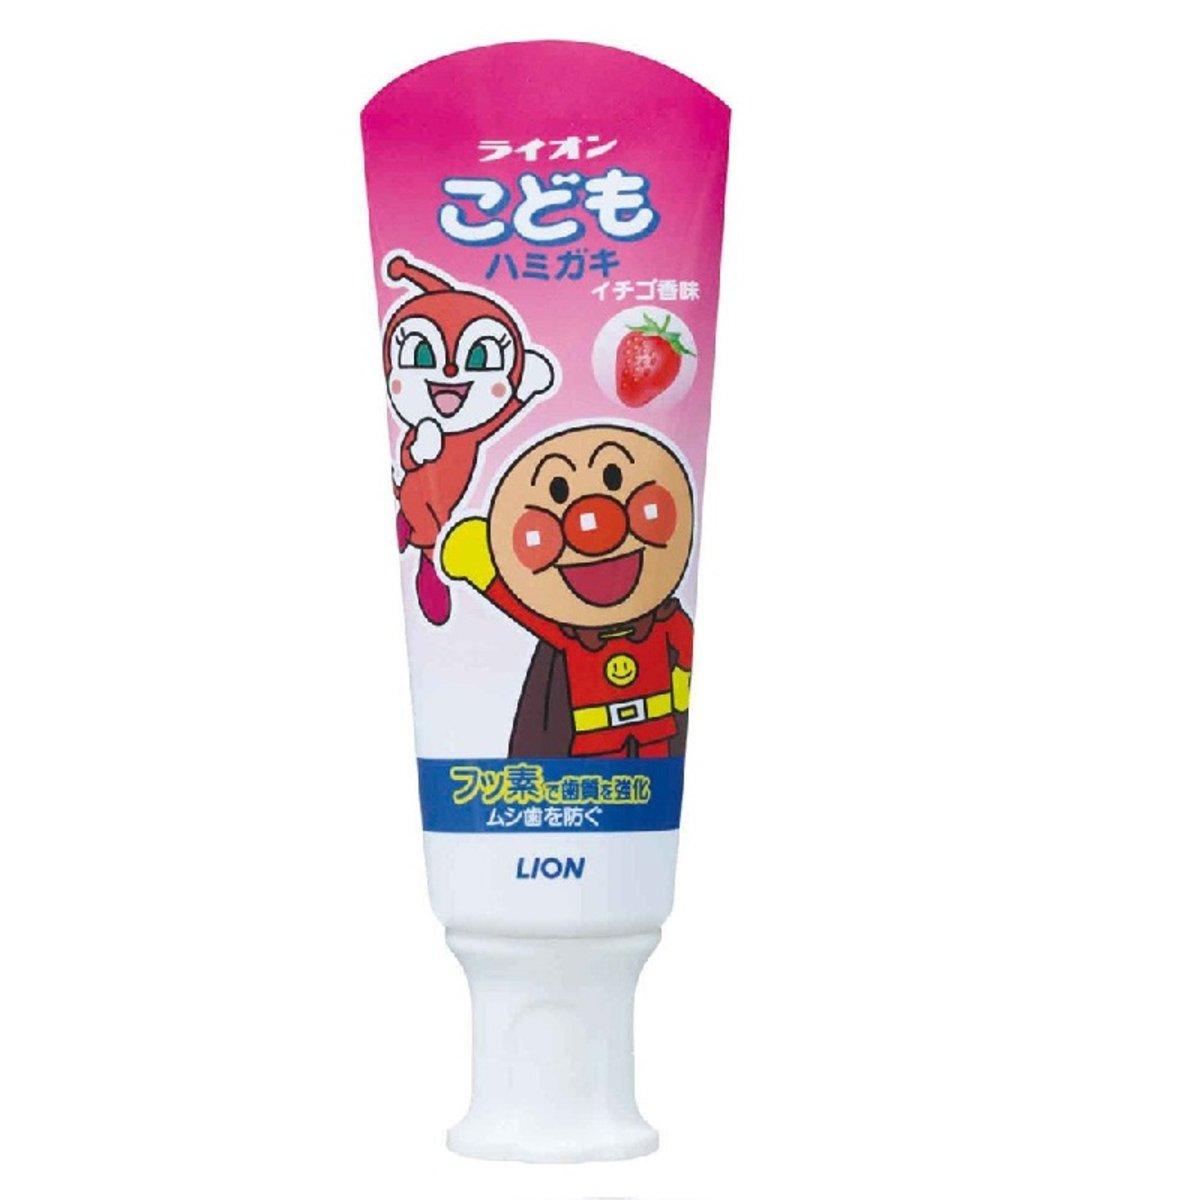 Lion Bread Superman Strengthen Tooth Children's Toothpaste(Pink) #Strawberry 40g